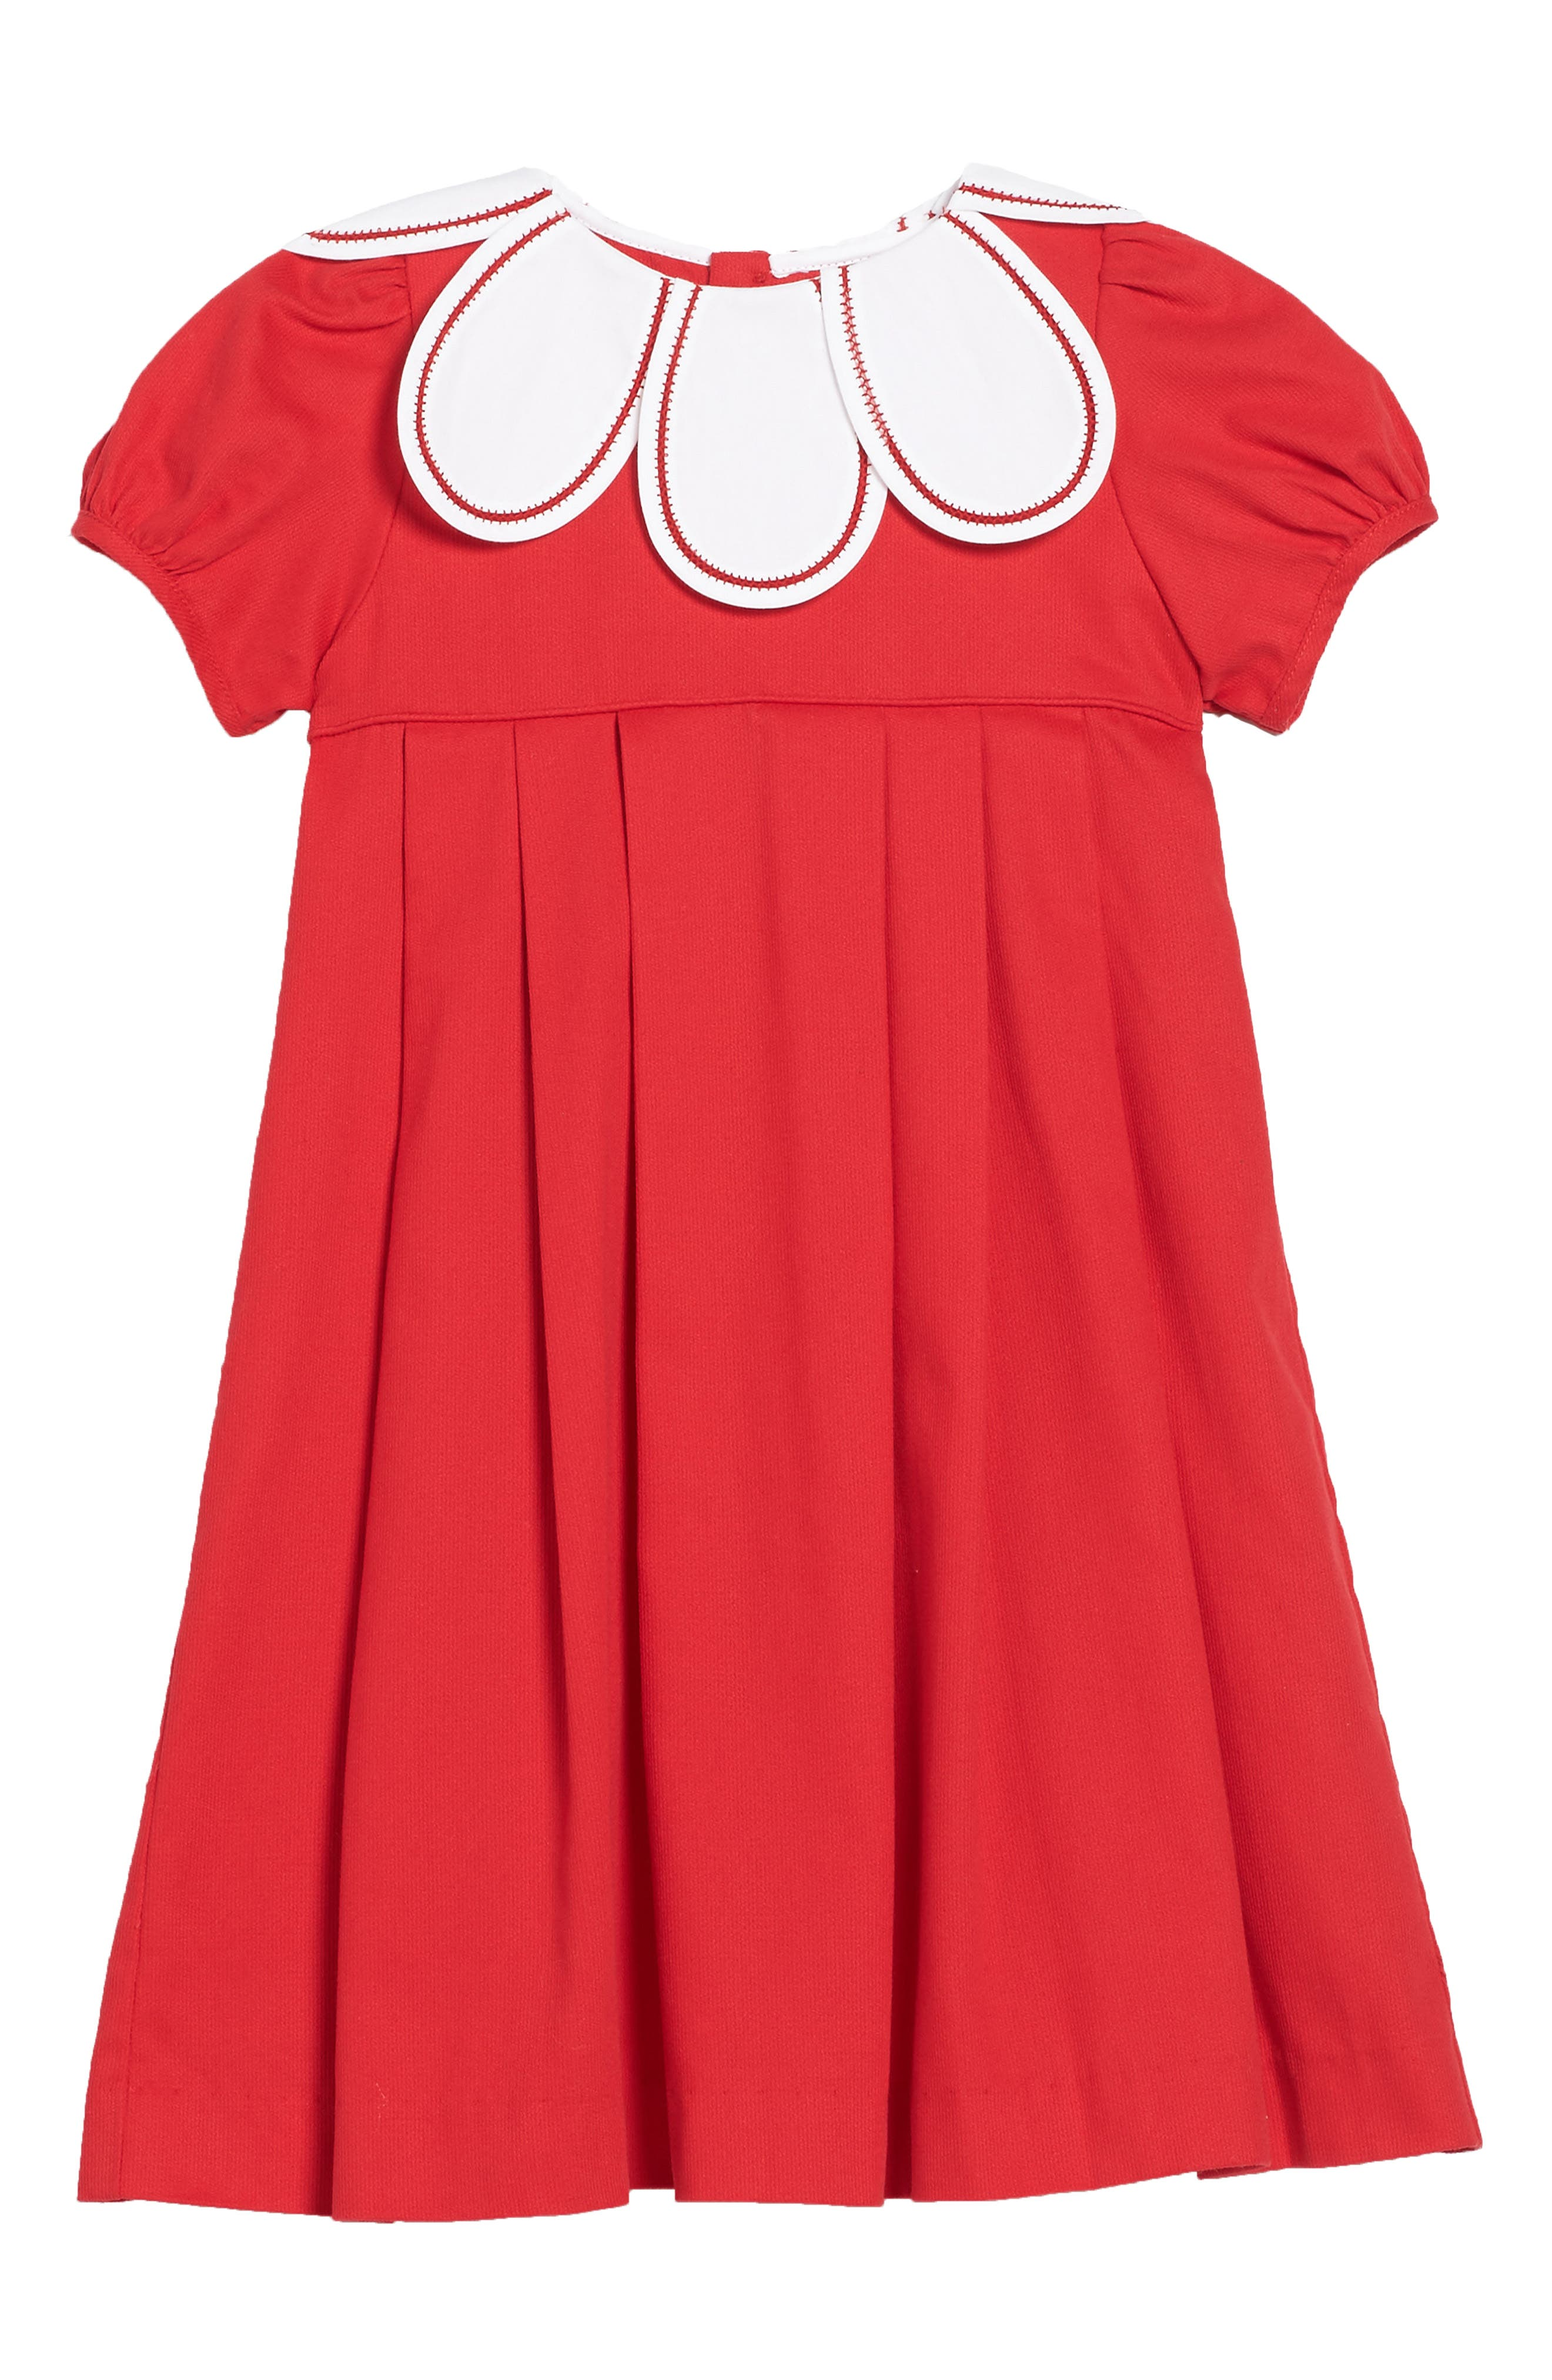 Daisy Collar Corduroy Dress,                         Main,                         color, Red